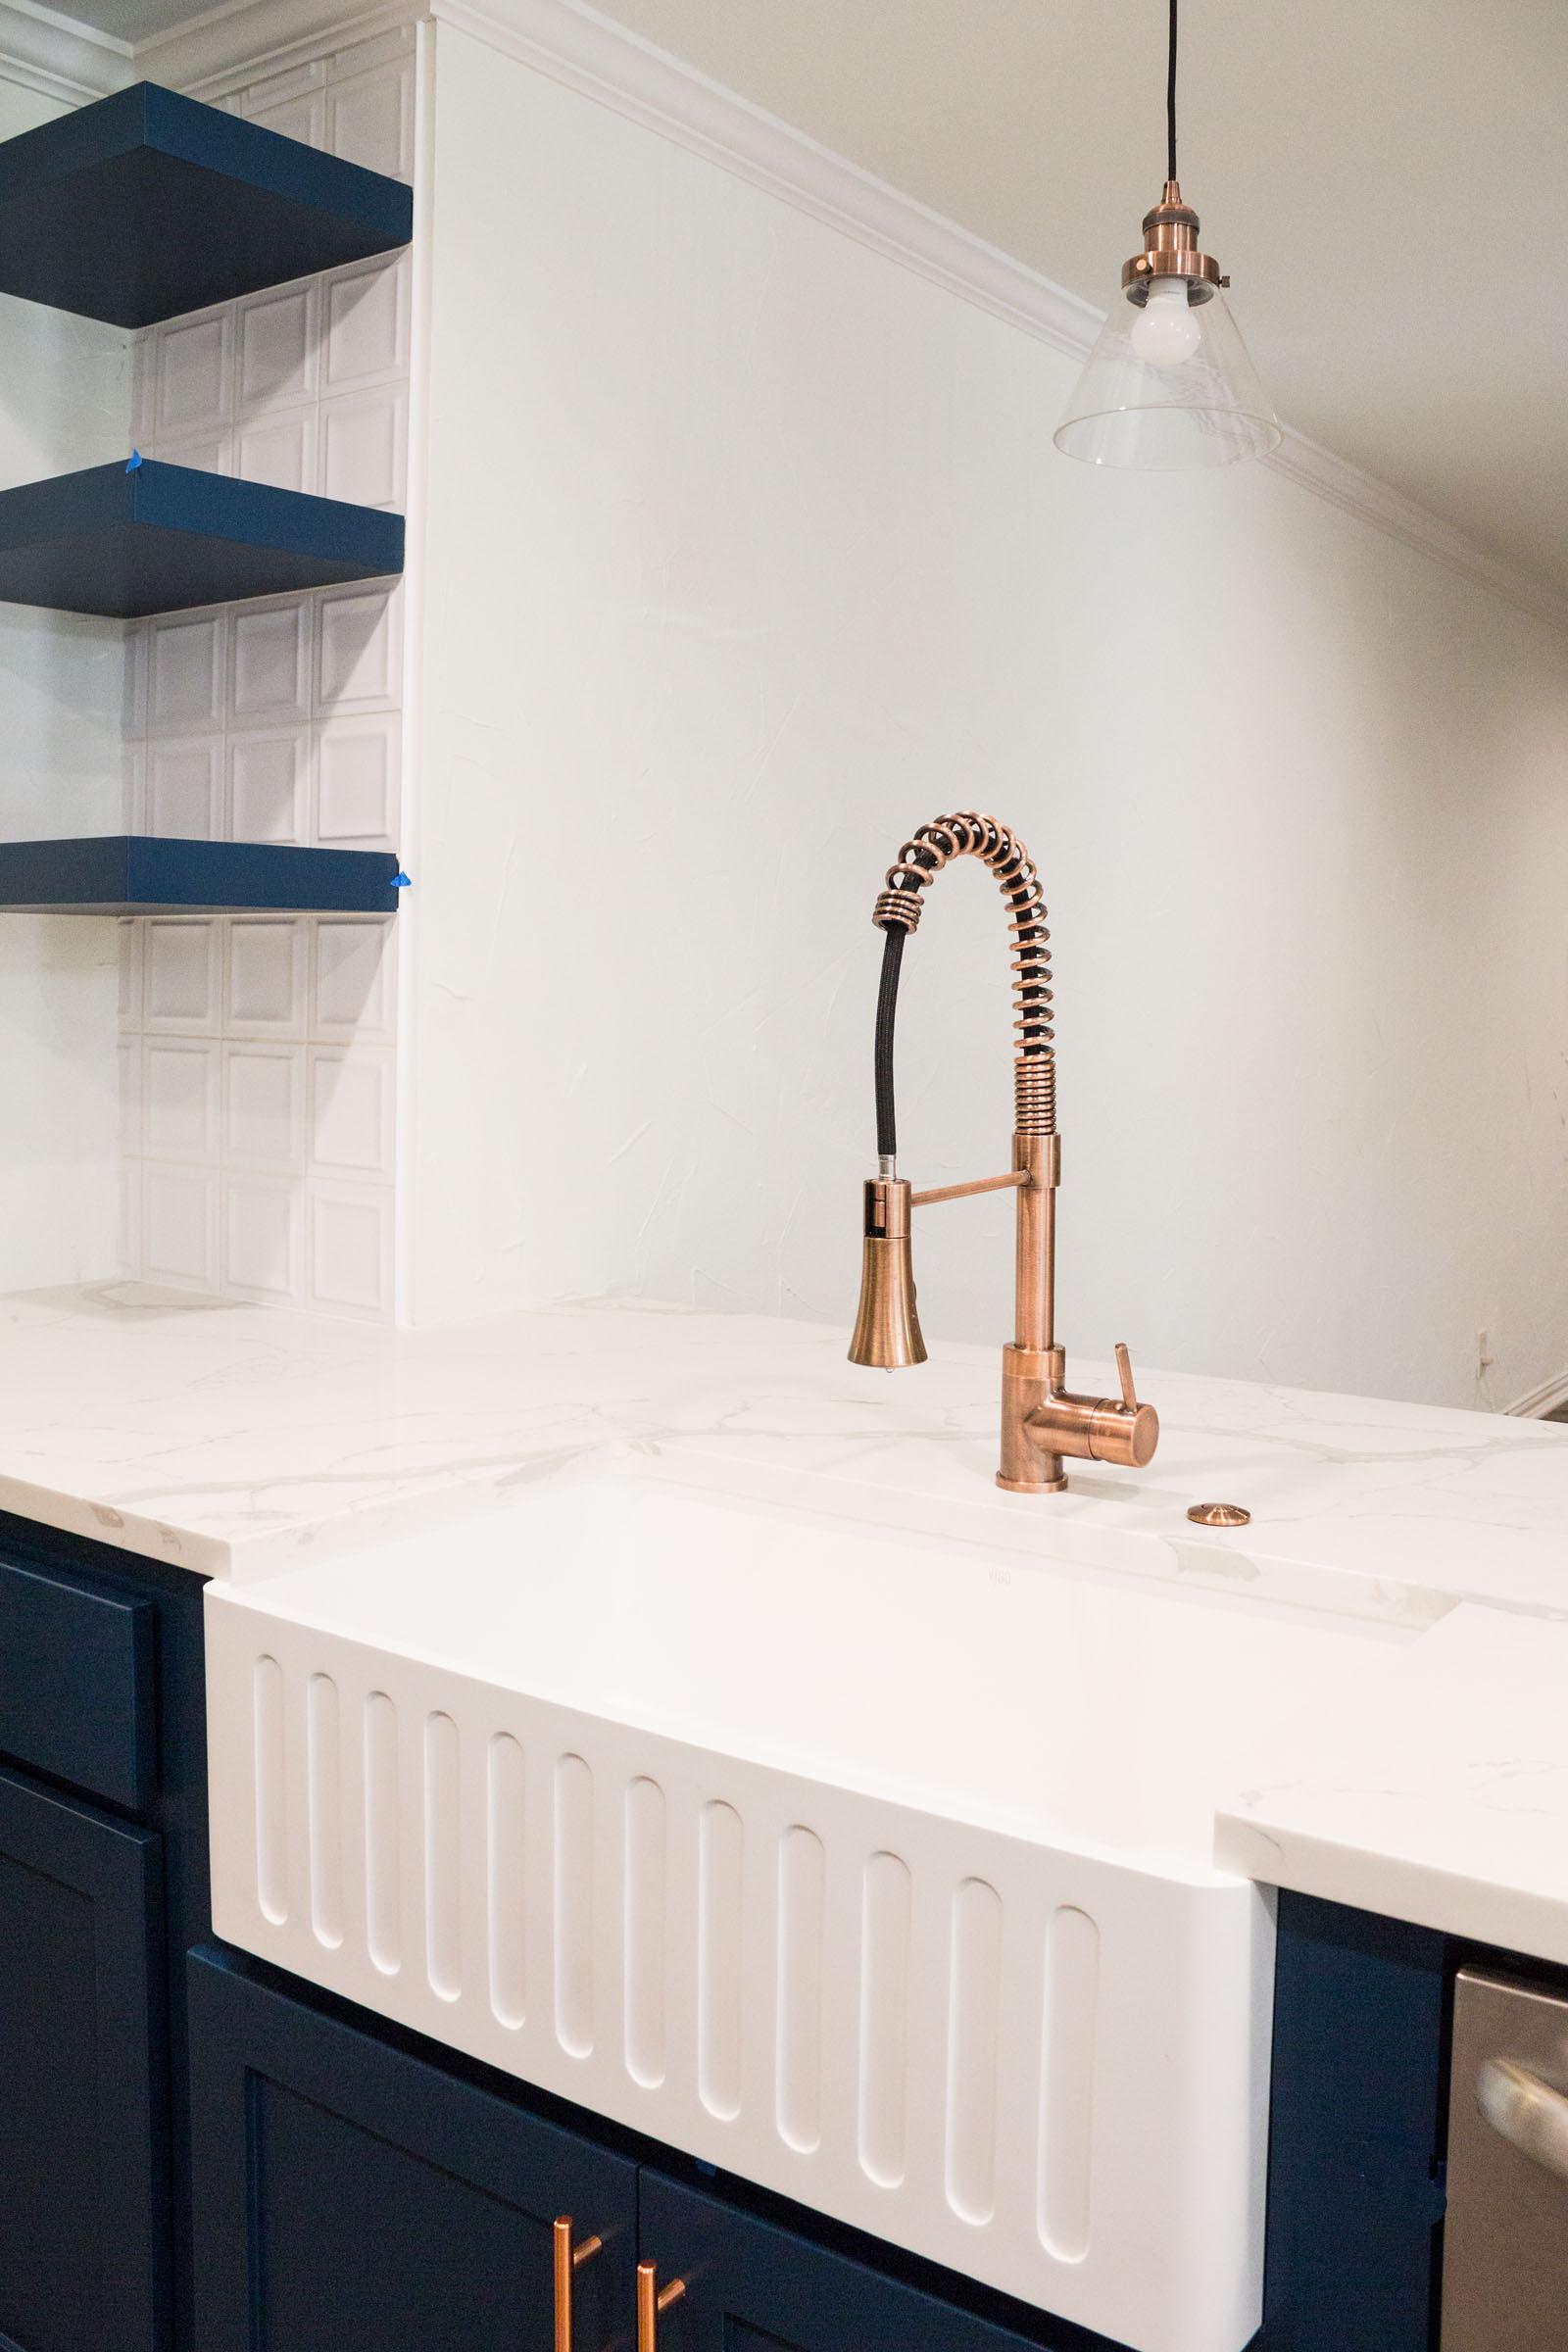 Navy floating shelves, white square backsplash tiles, white granite, copper accents